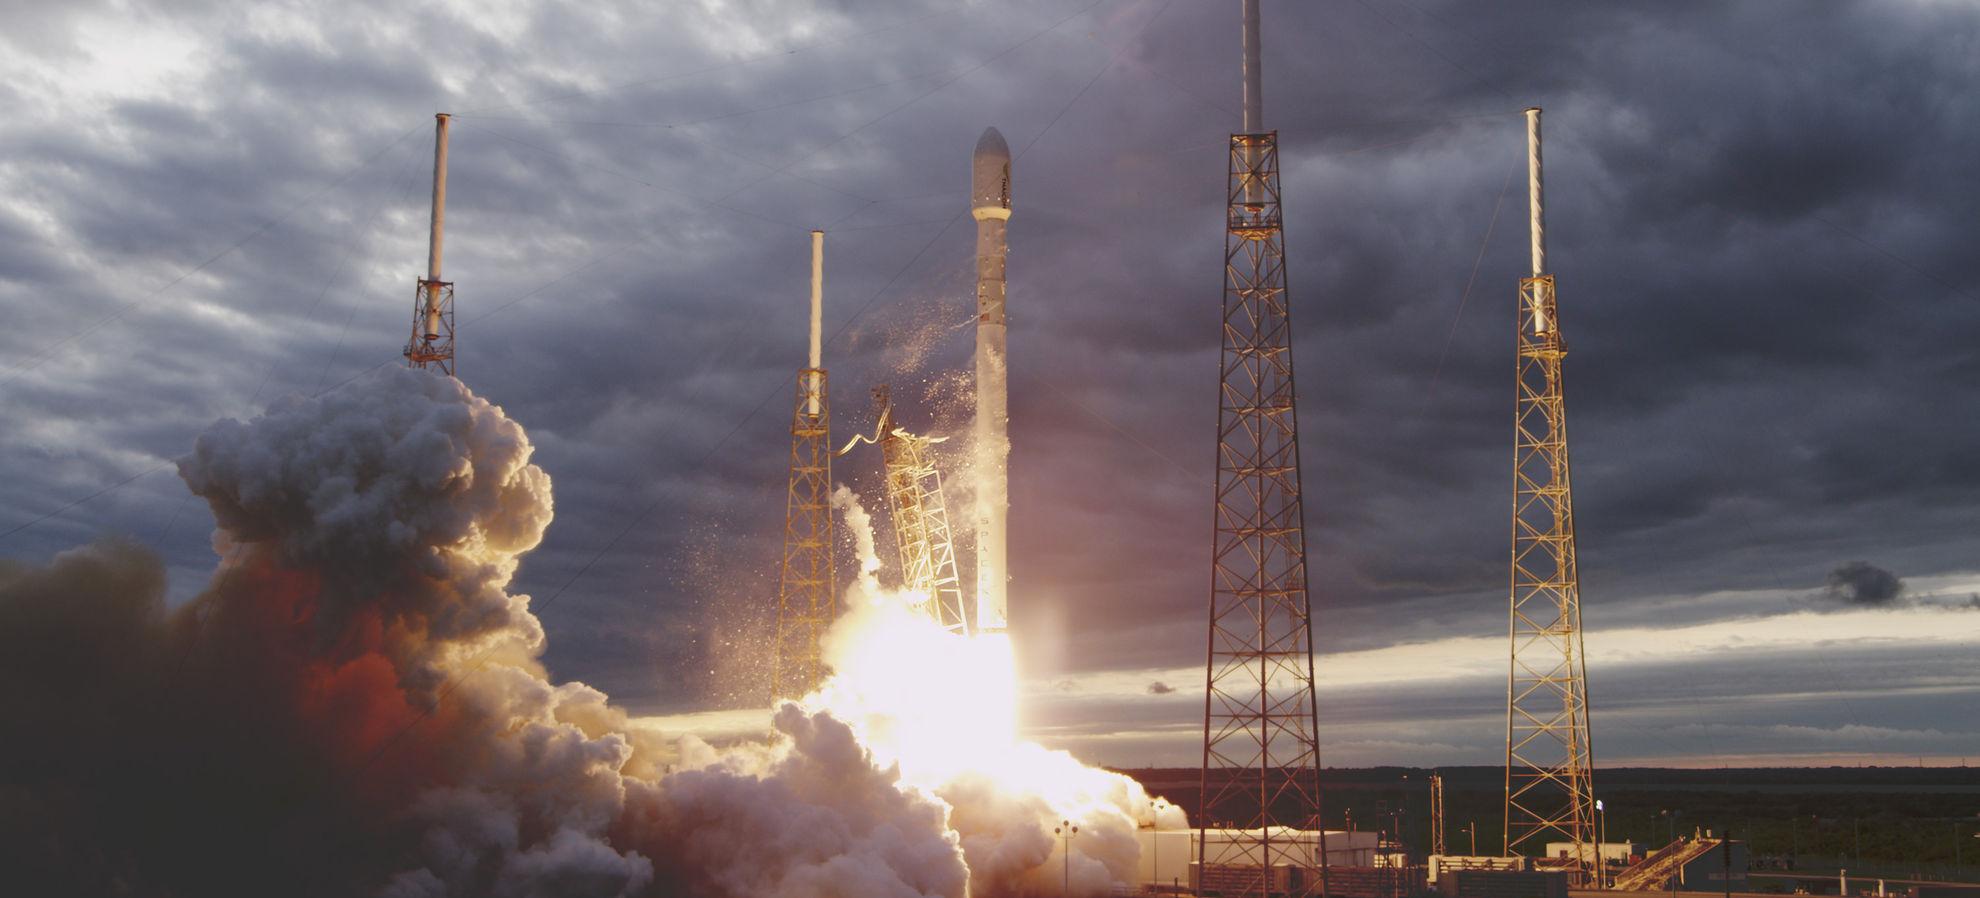 Cohete Falcon 9 despegando / SpaceX